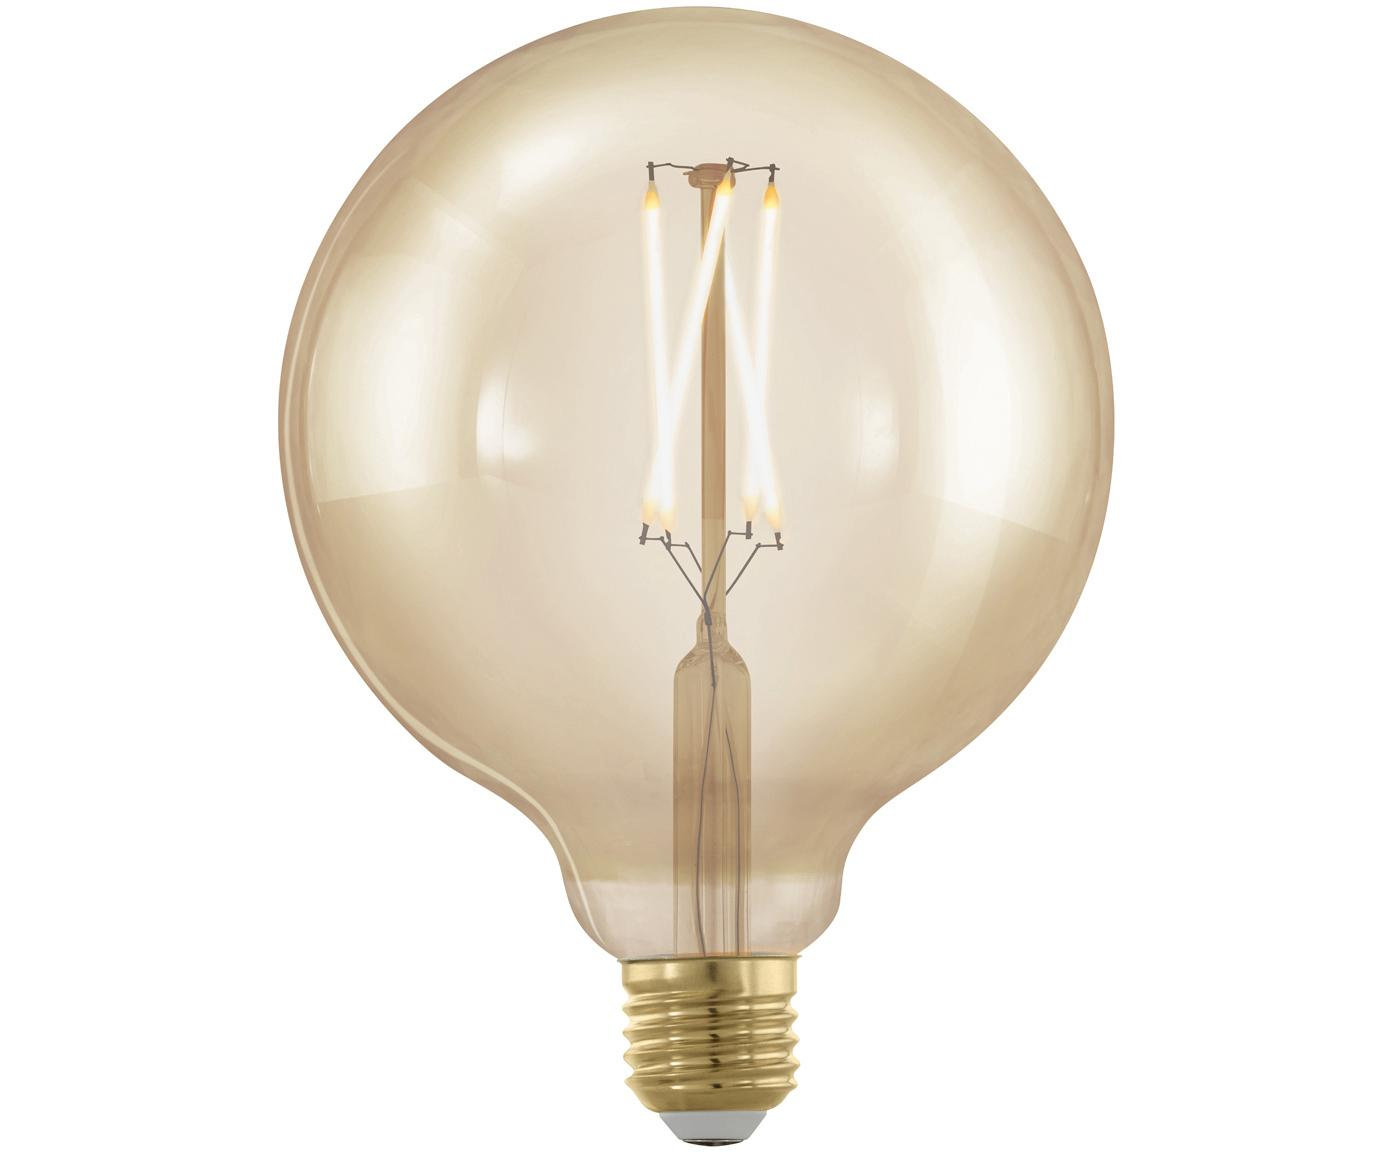 XL LED peertjes Cross voor warm licht (E27 / 4W) 5 stuks, Peertje: glas, Fitting: aluminium, Transparant, amberkleurig, Ø 13 x H 17 cm